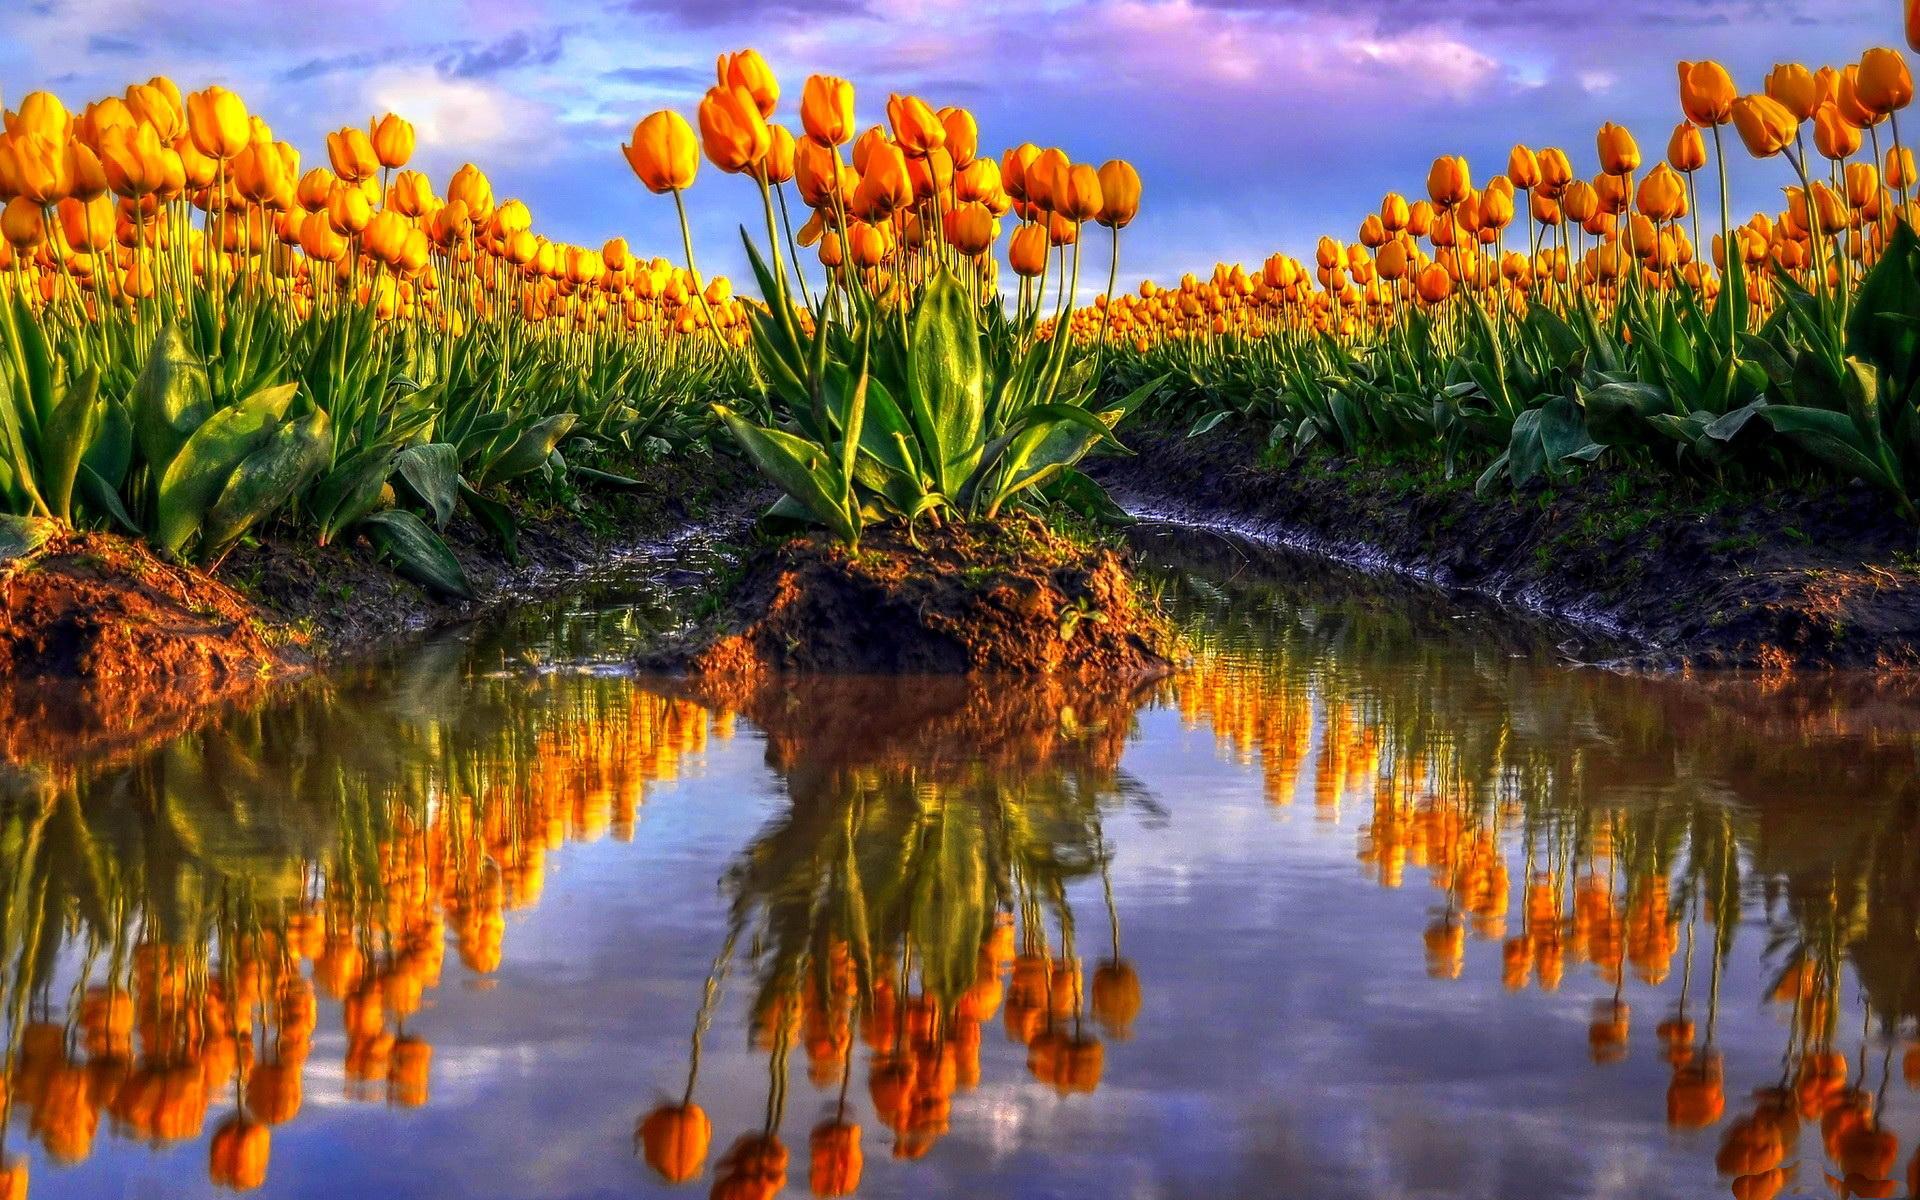 Cute Sunflower Wallpaper Tulip Photos Free Hd Desktop Wallpapers 4k Hd